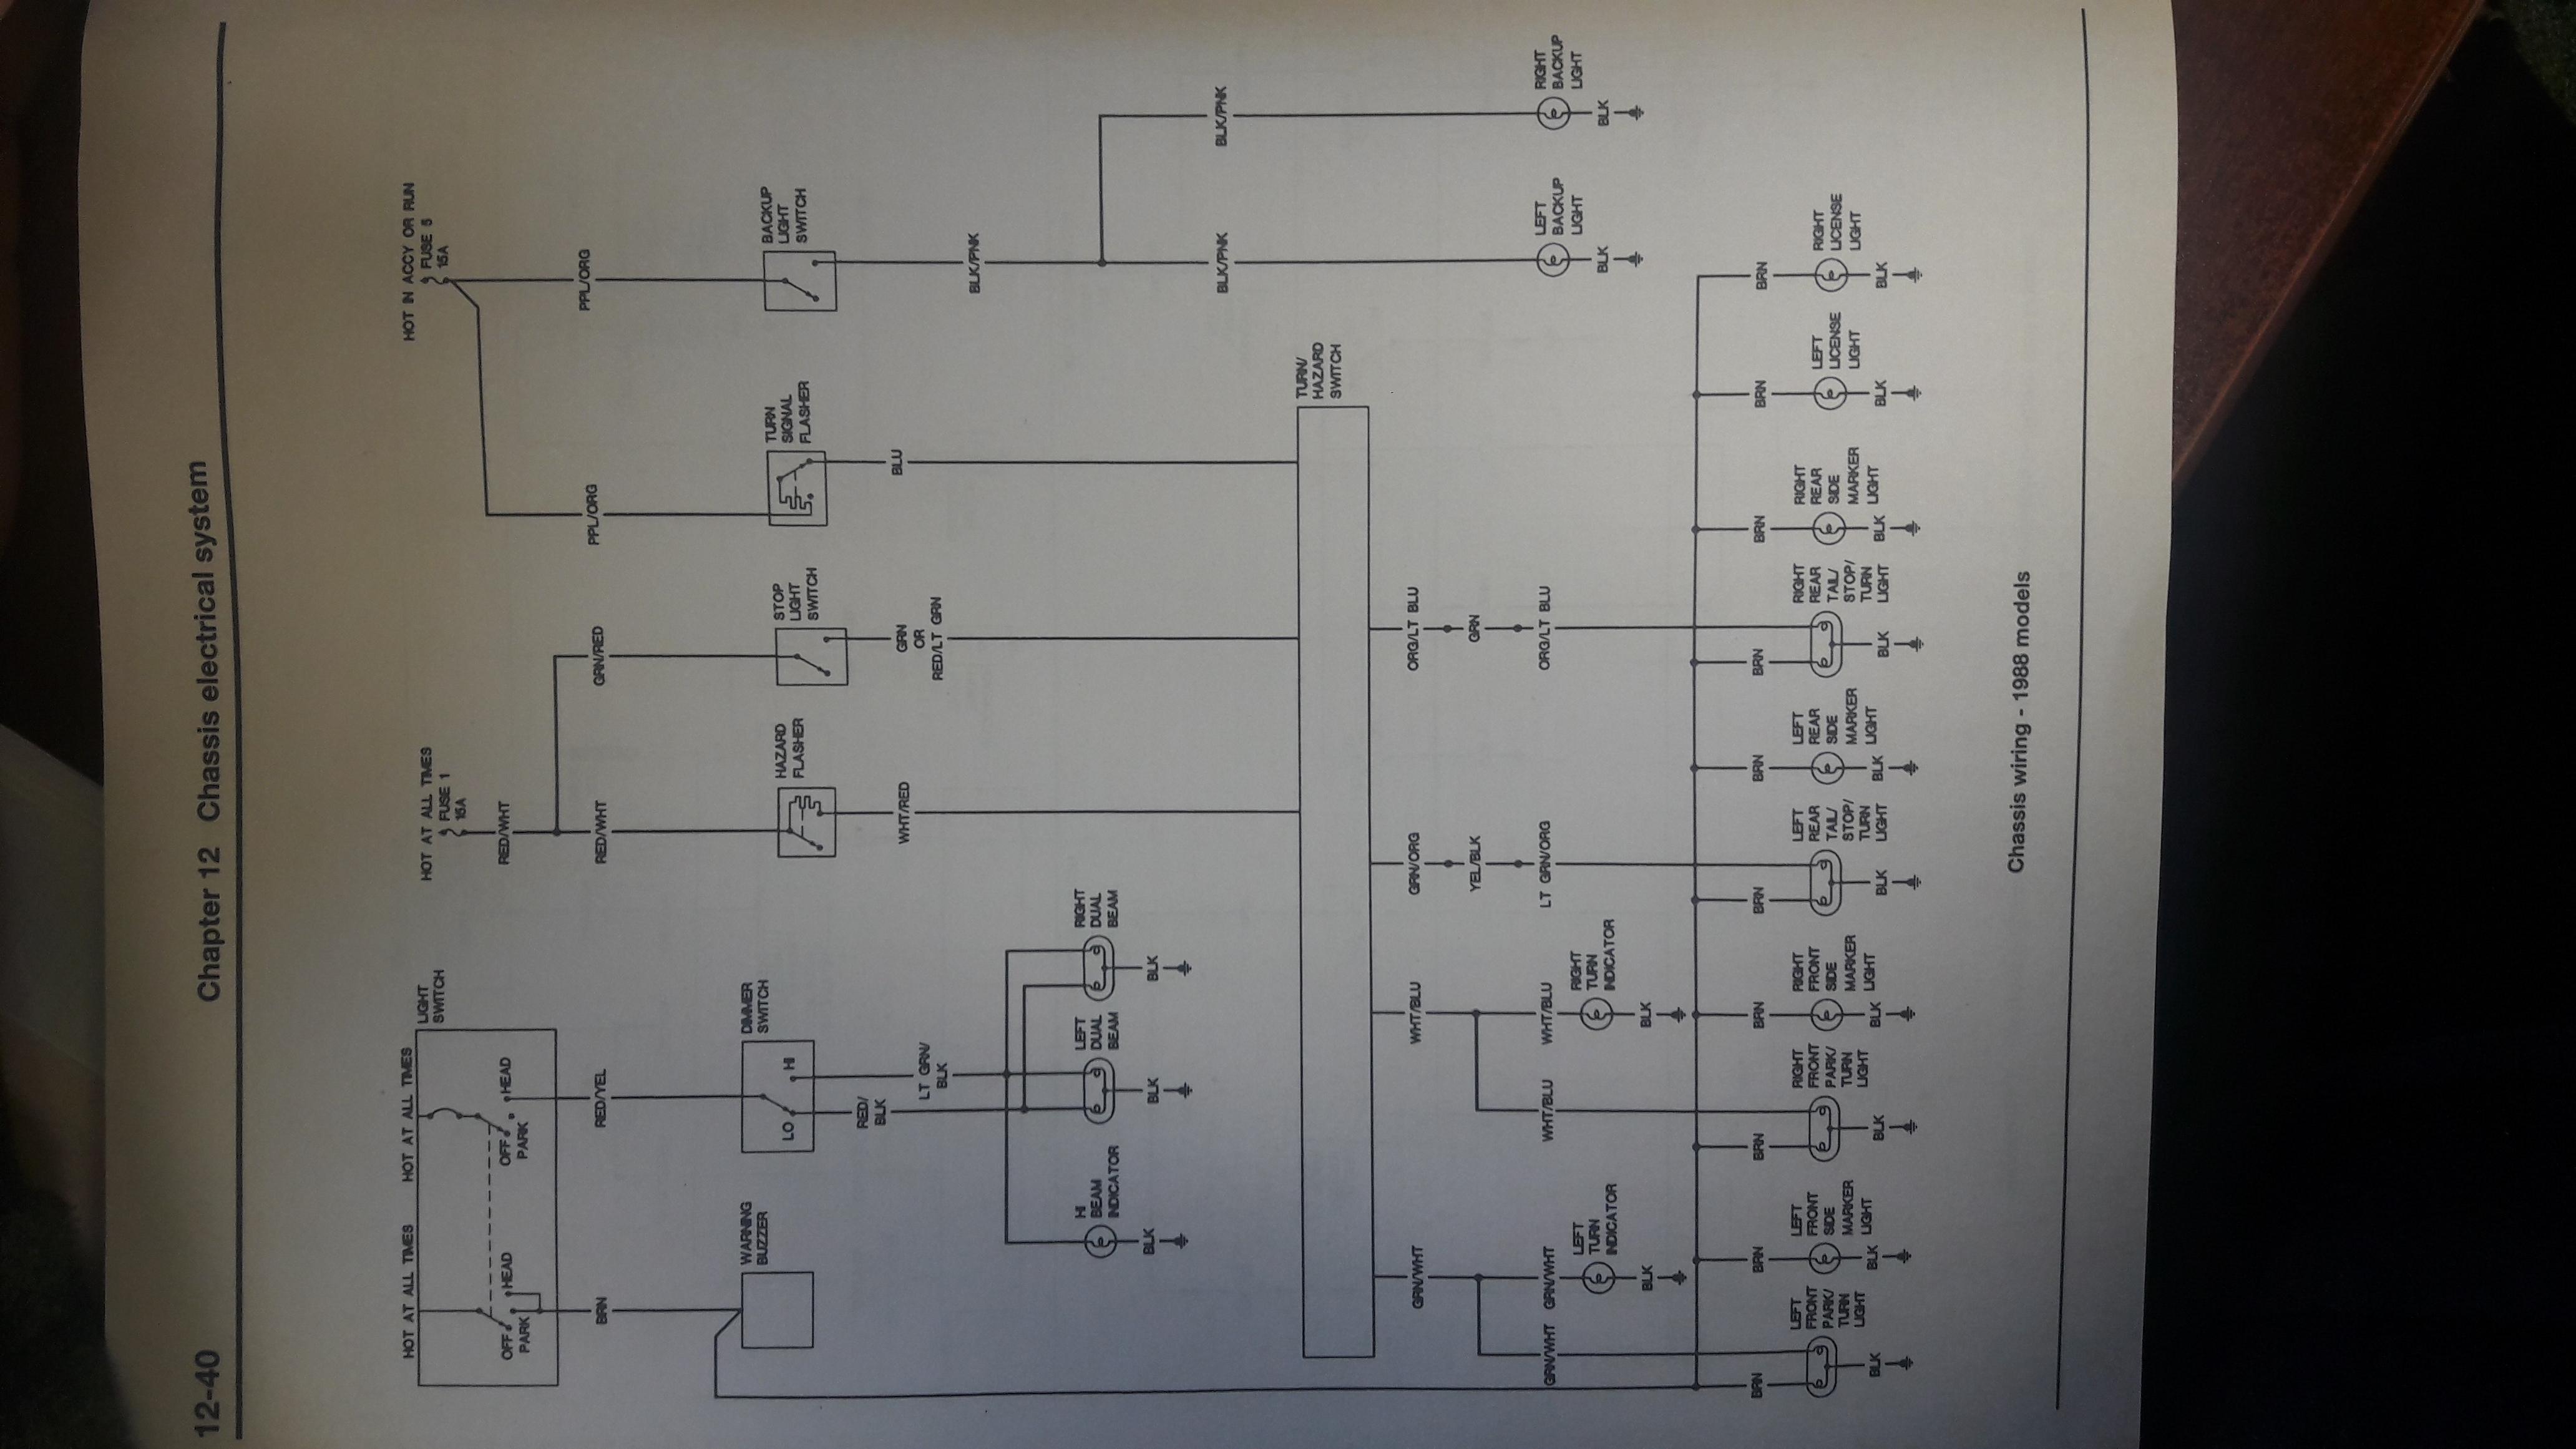 rialta wiring diagram rvia wiring diagram mazda 3 wiper wiring diagram jeep  cj7